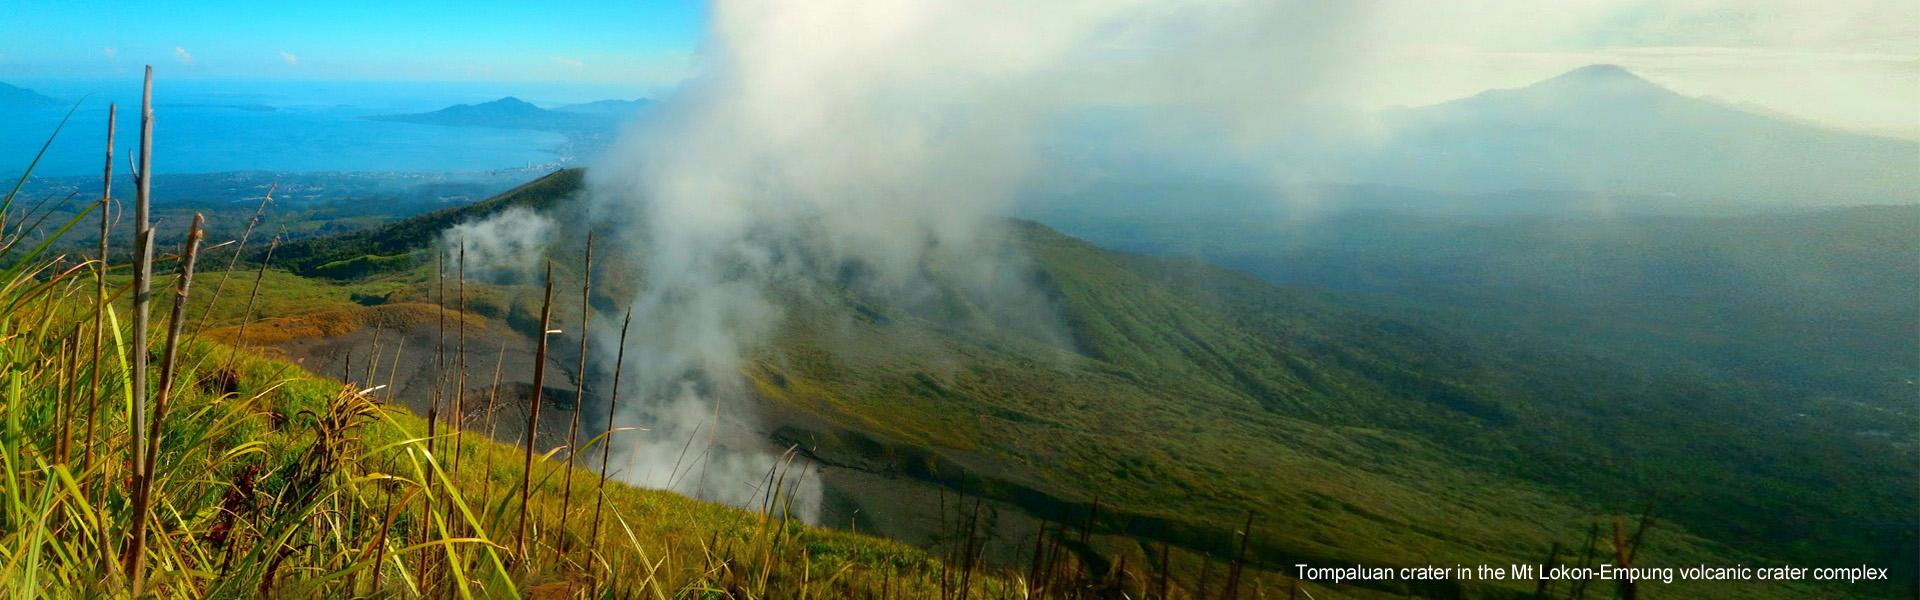 Tompaluan crater in the Mt Lokon-Empung volcanic